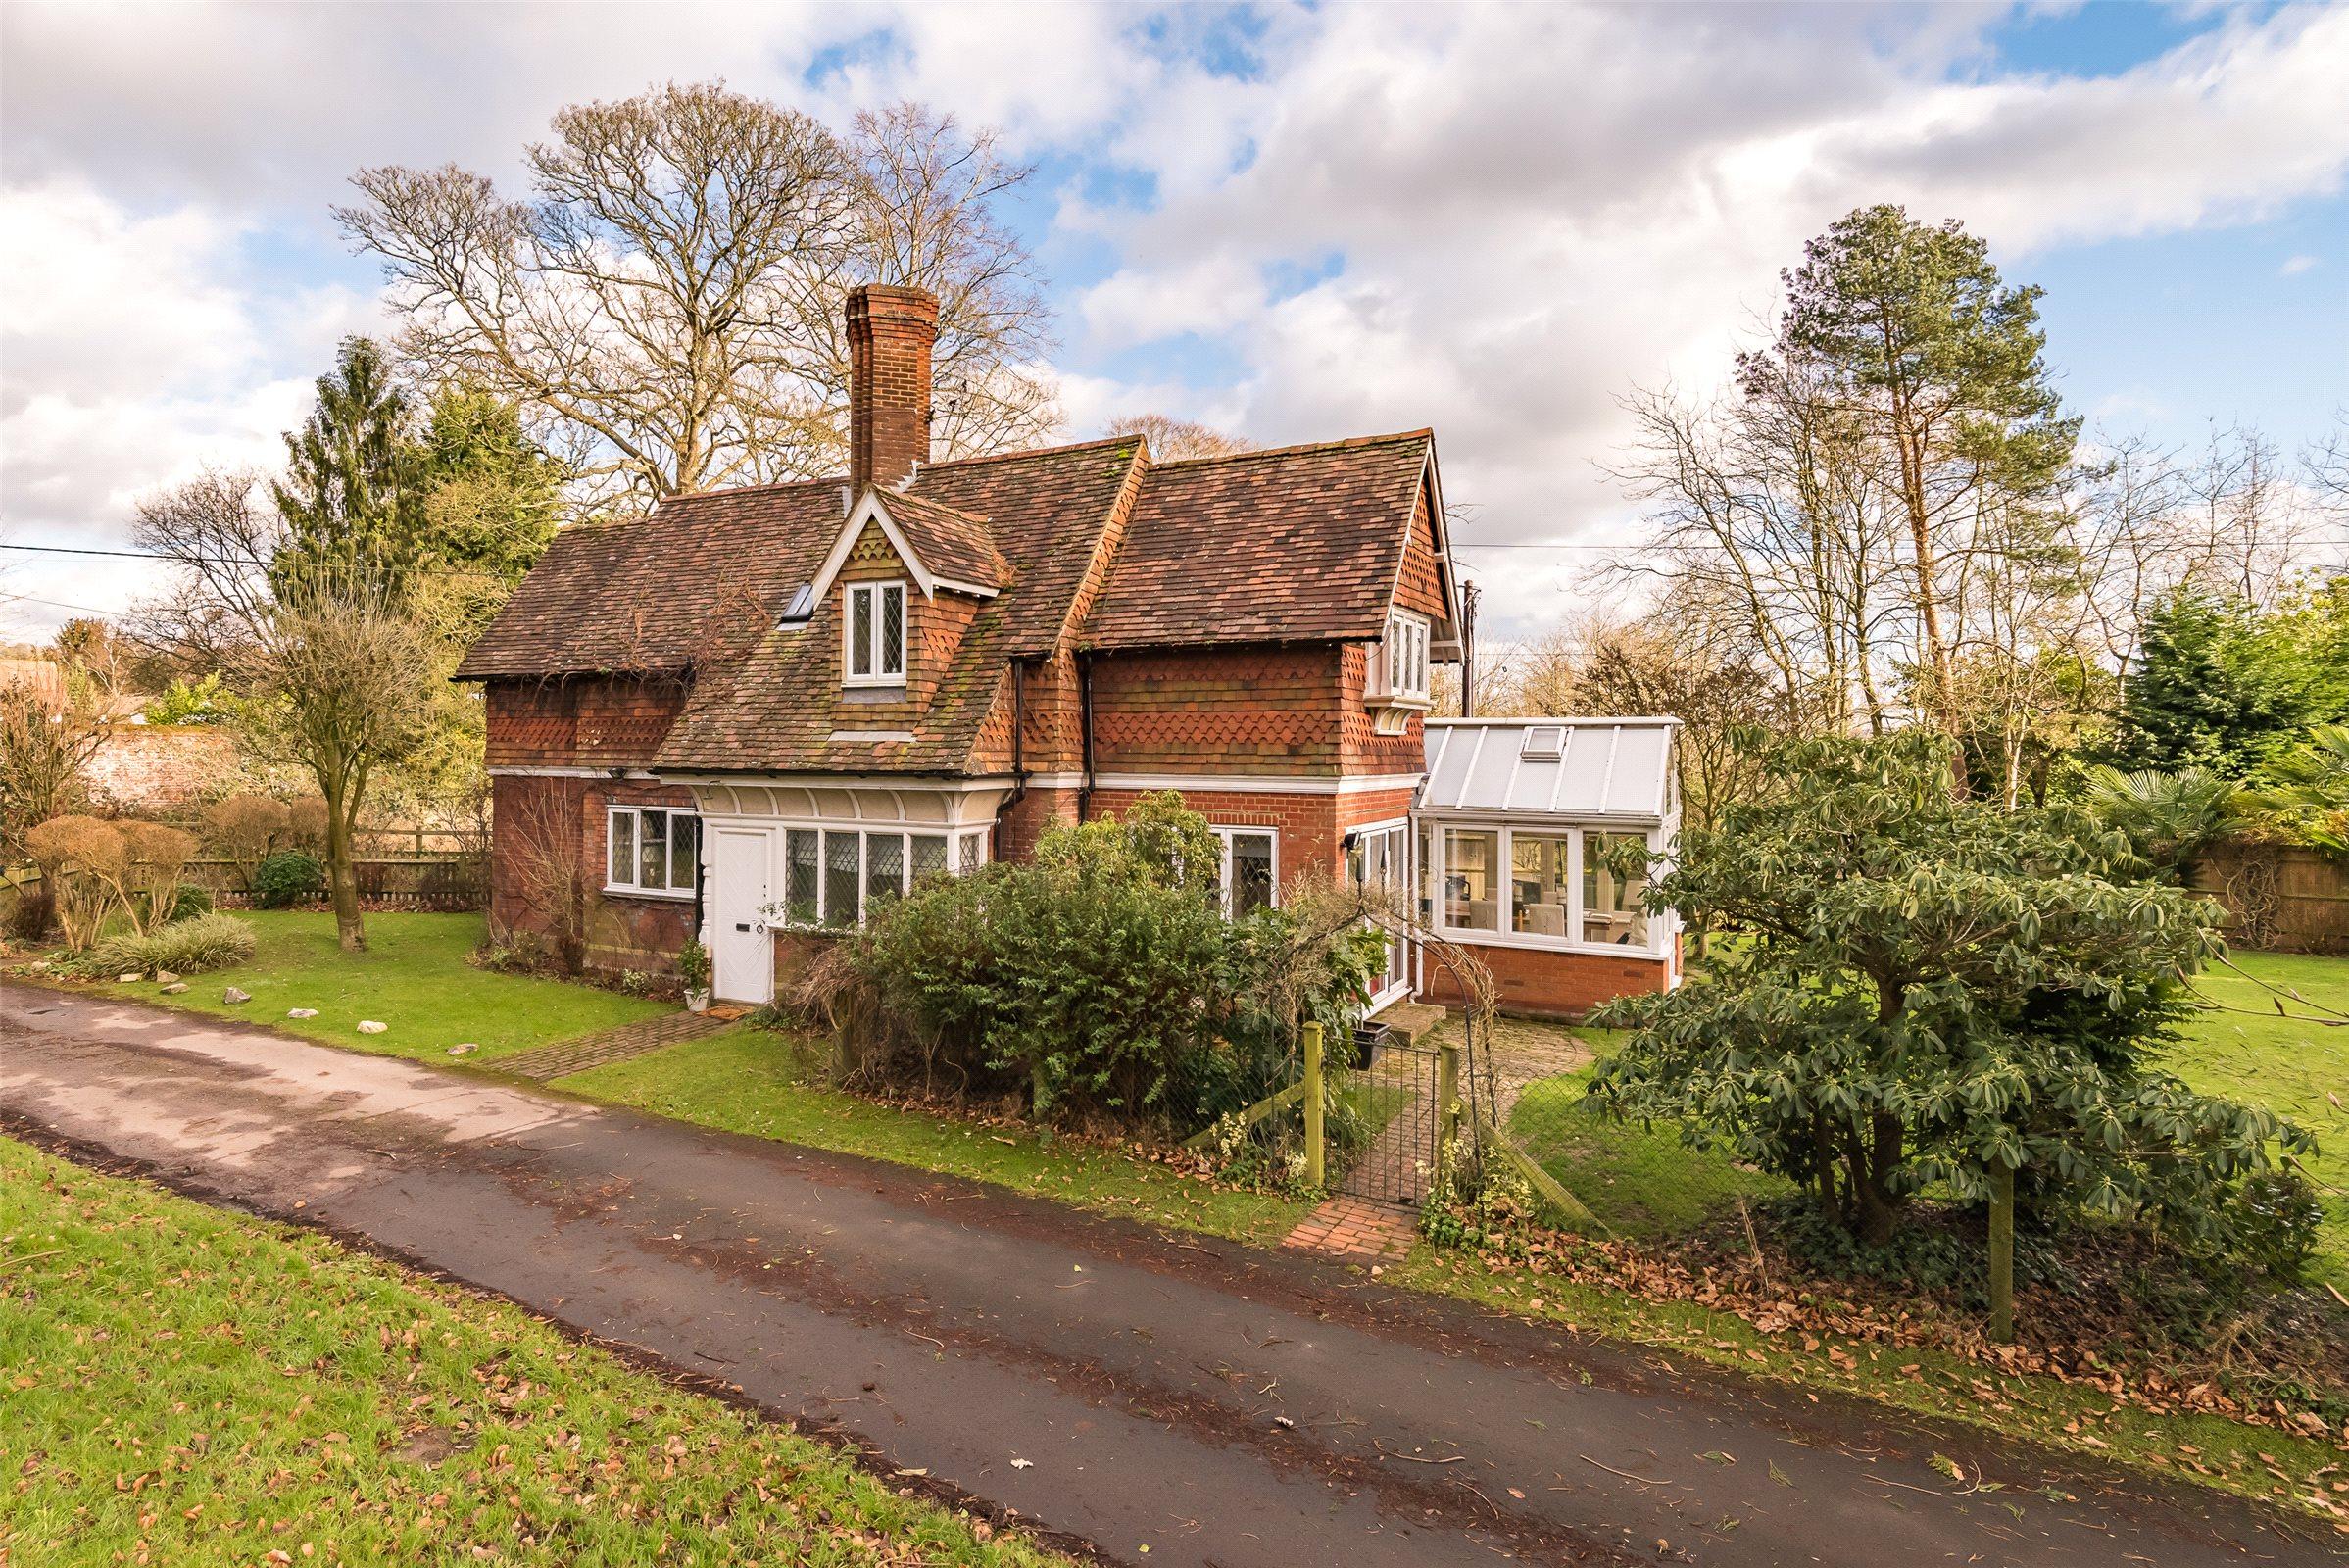 3 Bedrooms Detached House for sale in Dungates Lane, Buckland, Betchworth, Surrey, RH3